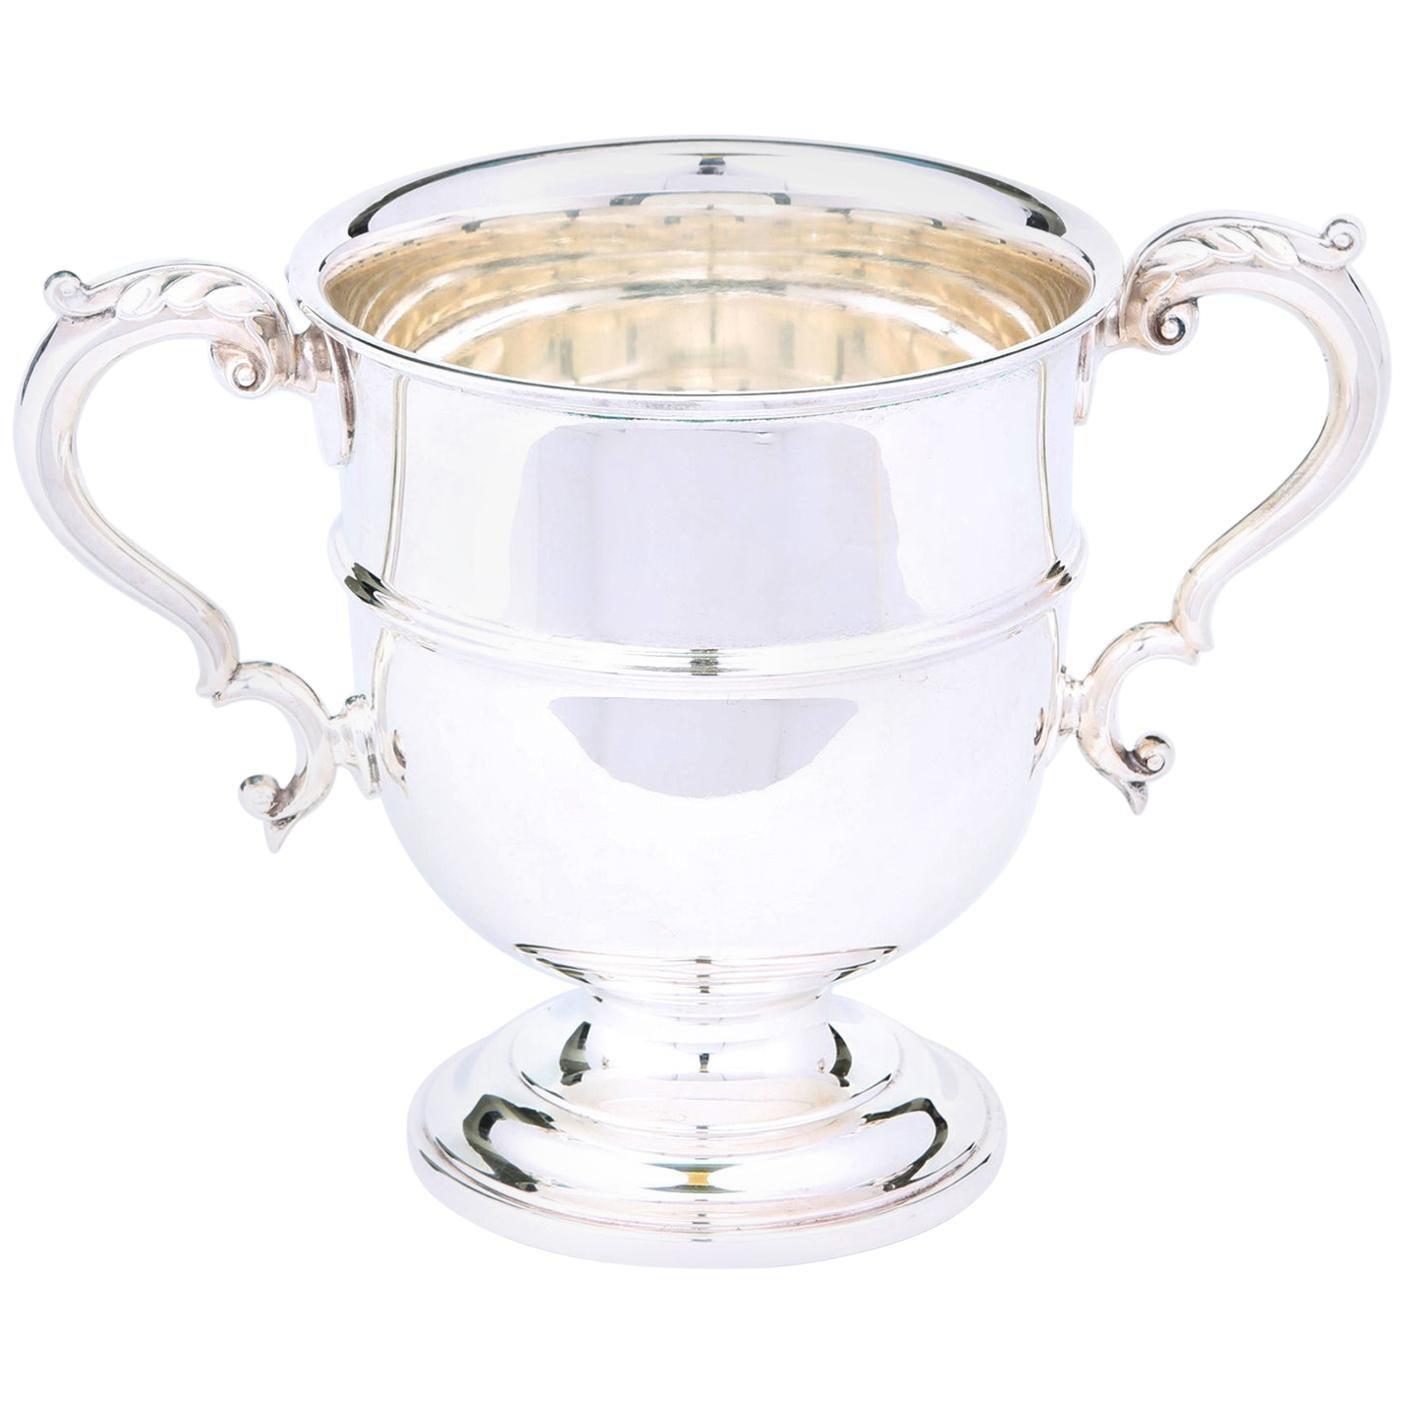 English Silver Plated Barware / Tableware Ice Bucket